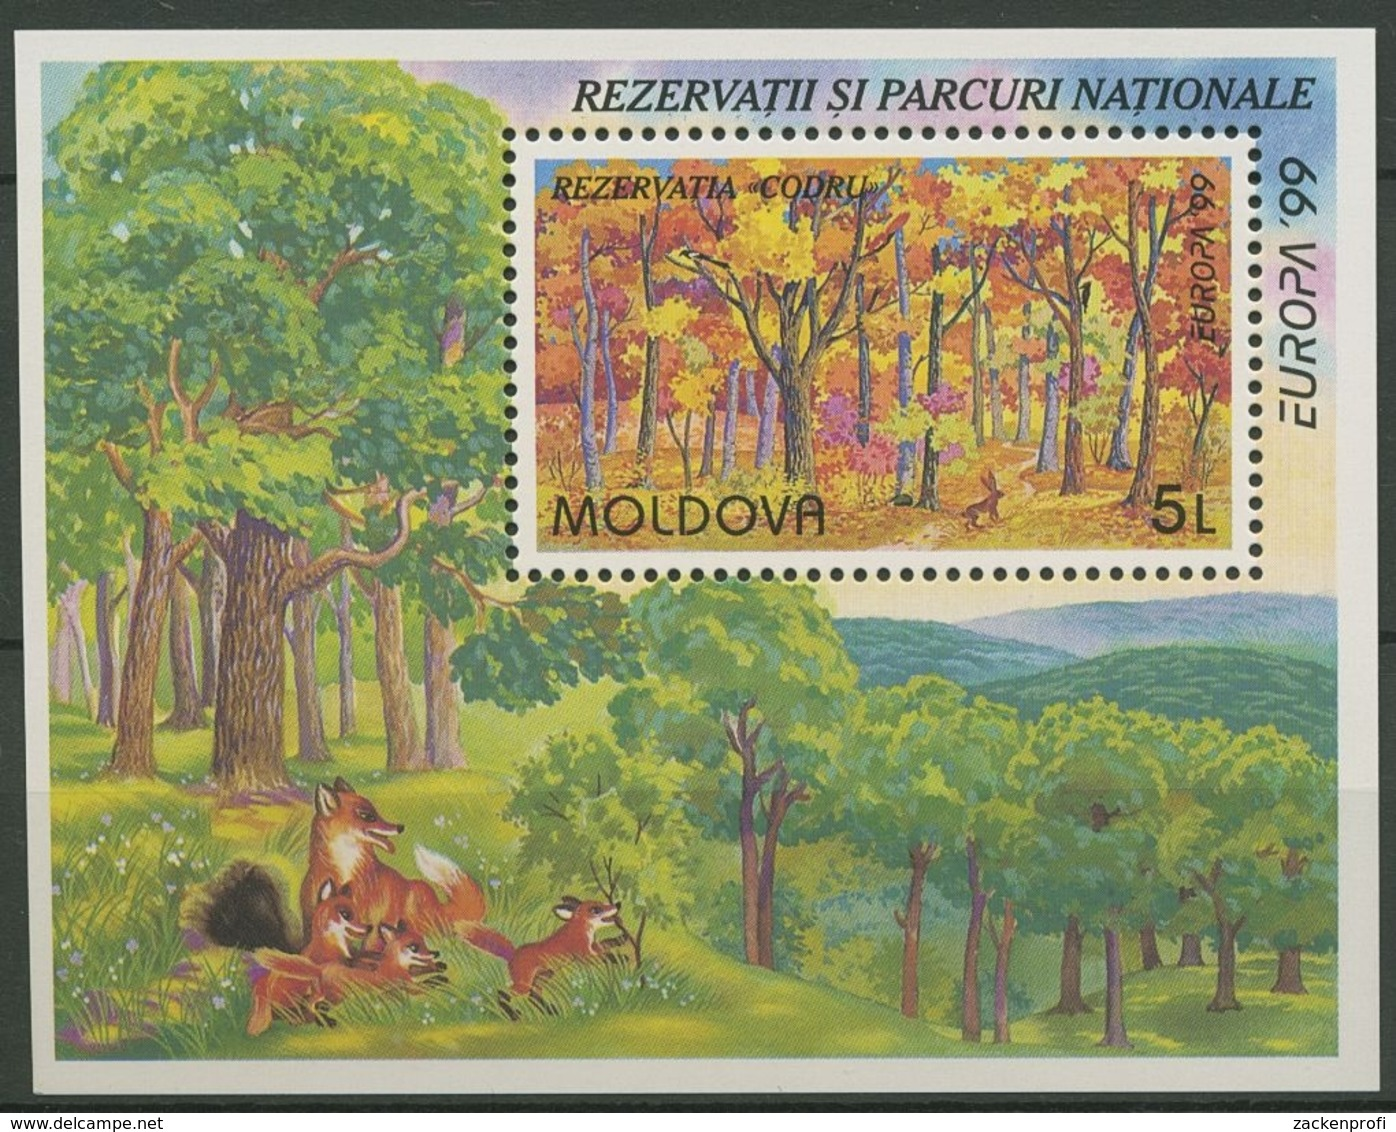 Moldawien 1999 Europa CEPT Nationalparks Block 18 Postfrisch (C90314) - Moldawien (Moldau)